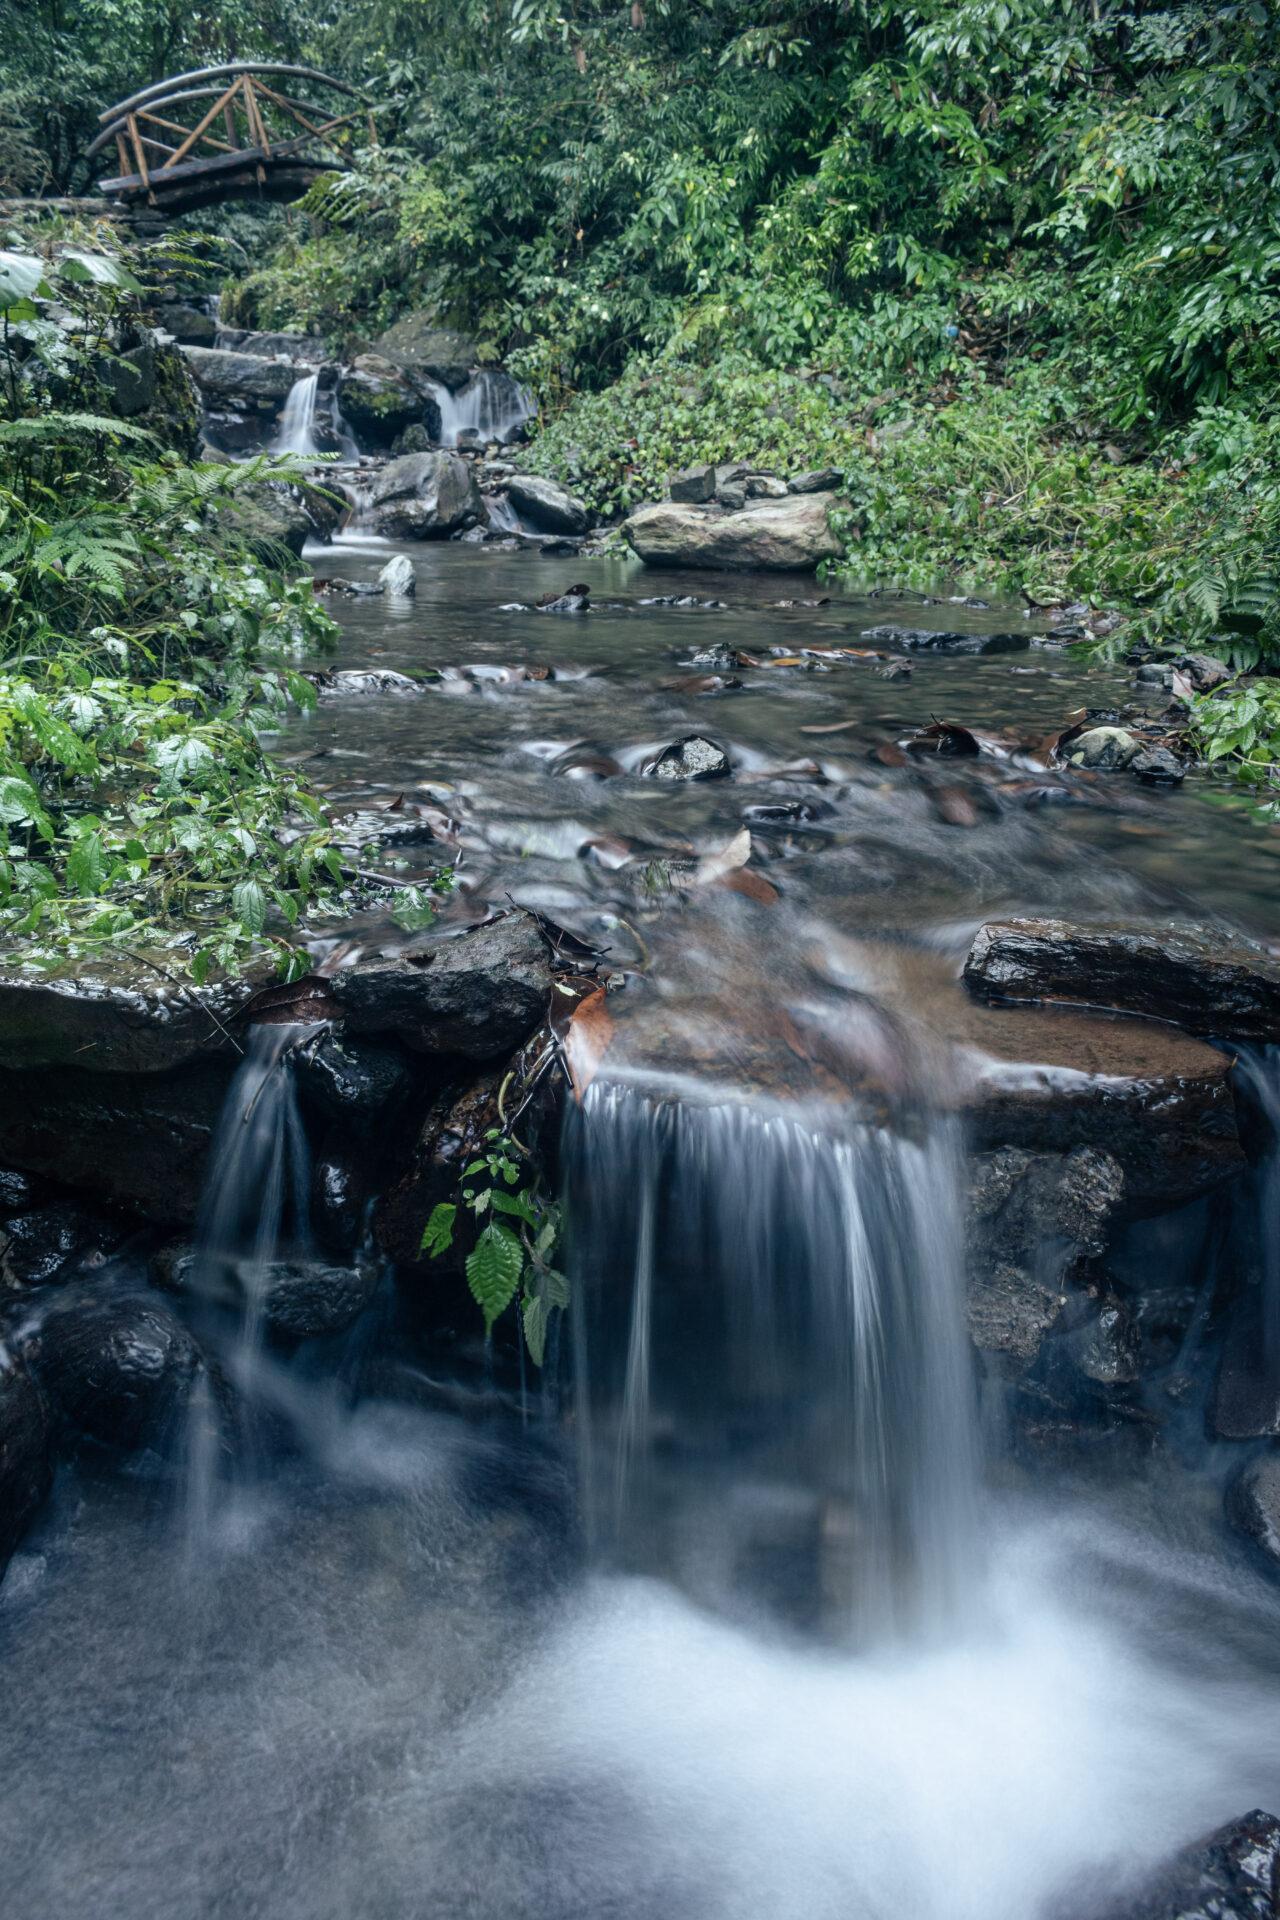 Small Water Stream on the way to Jibhi Waterfall